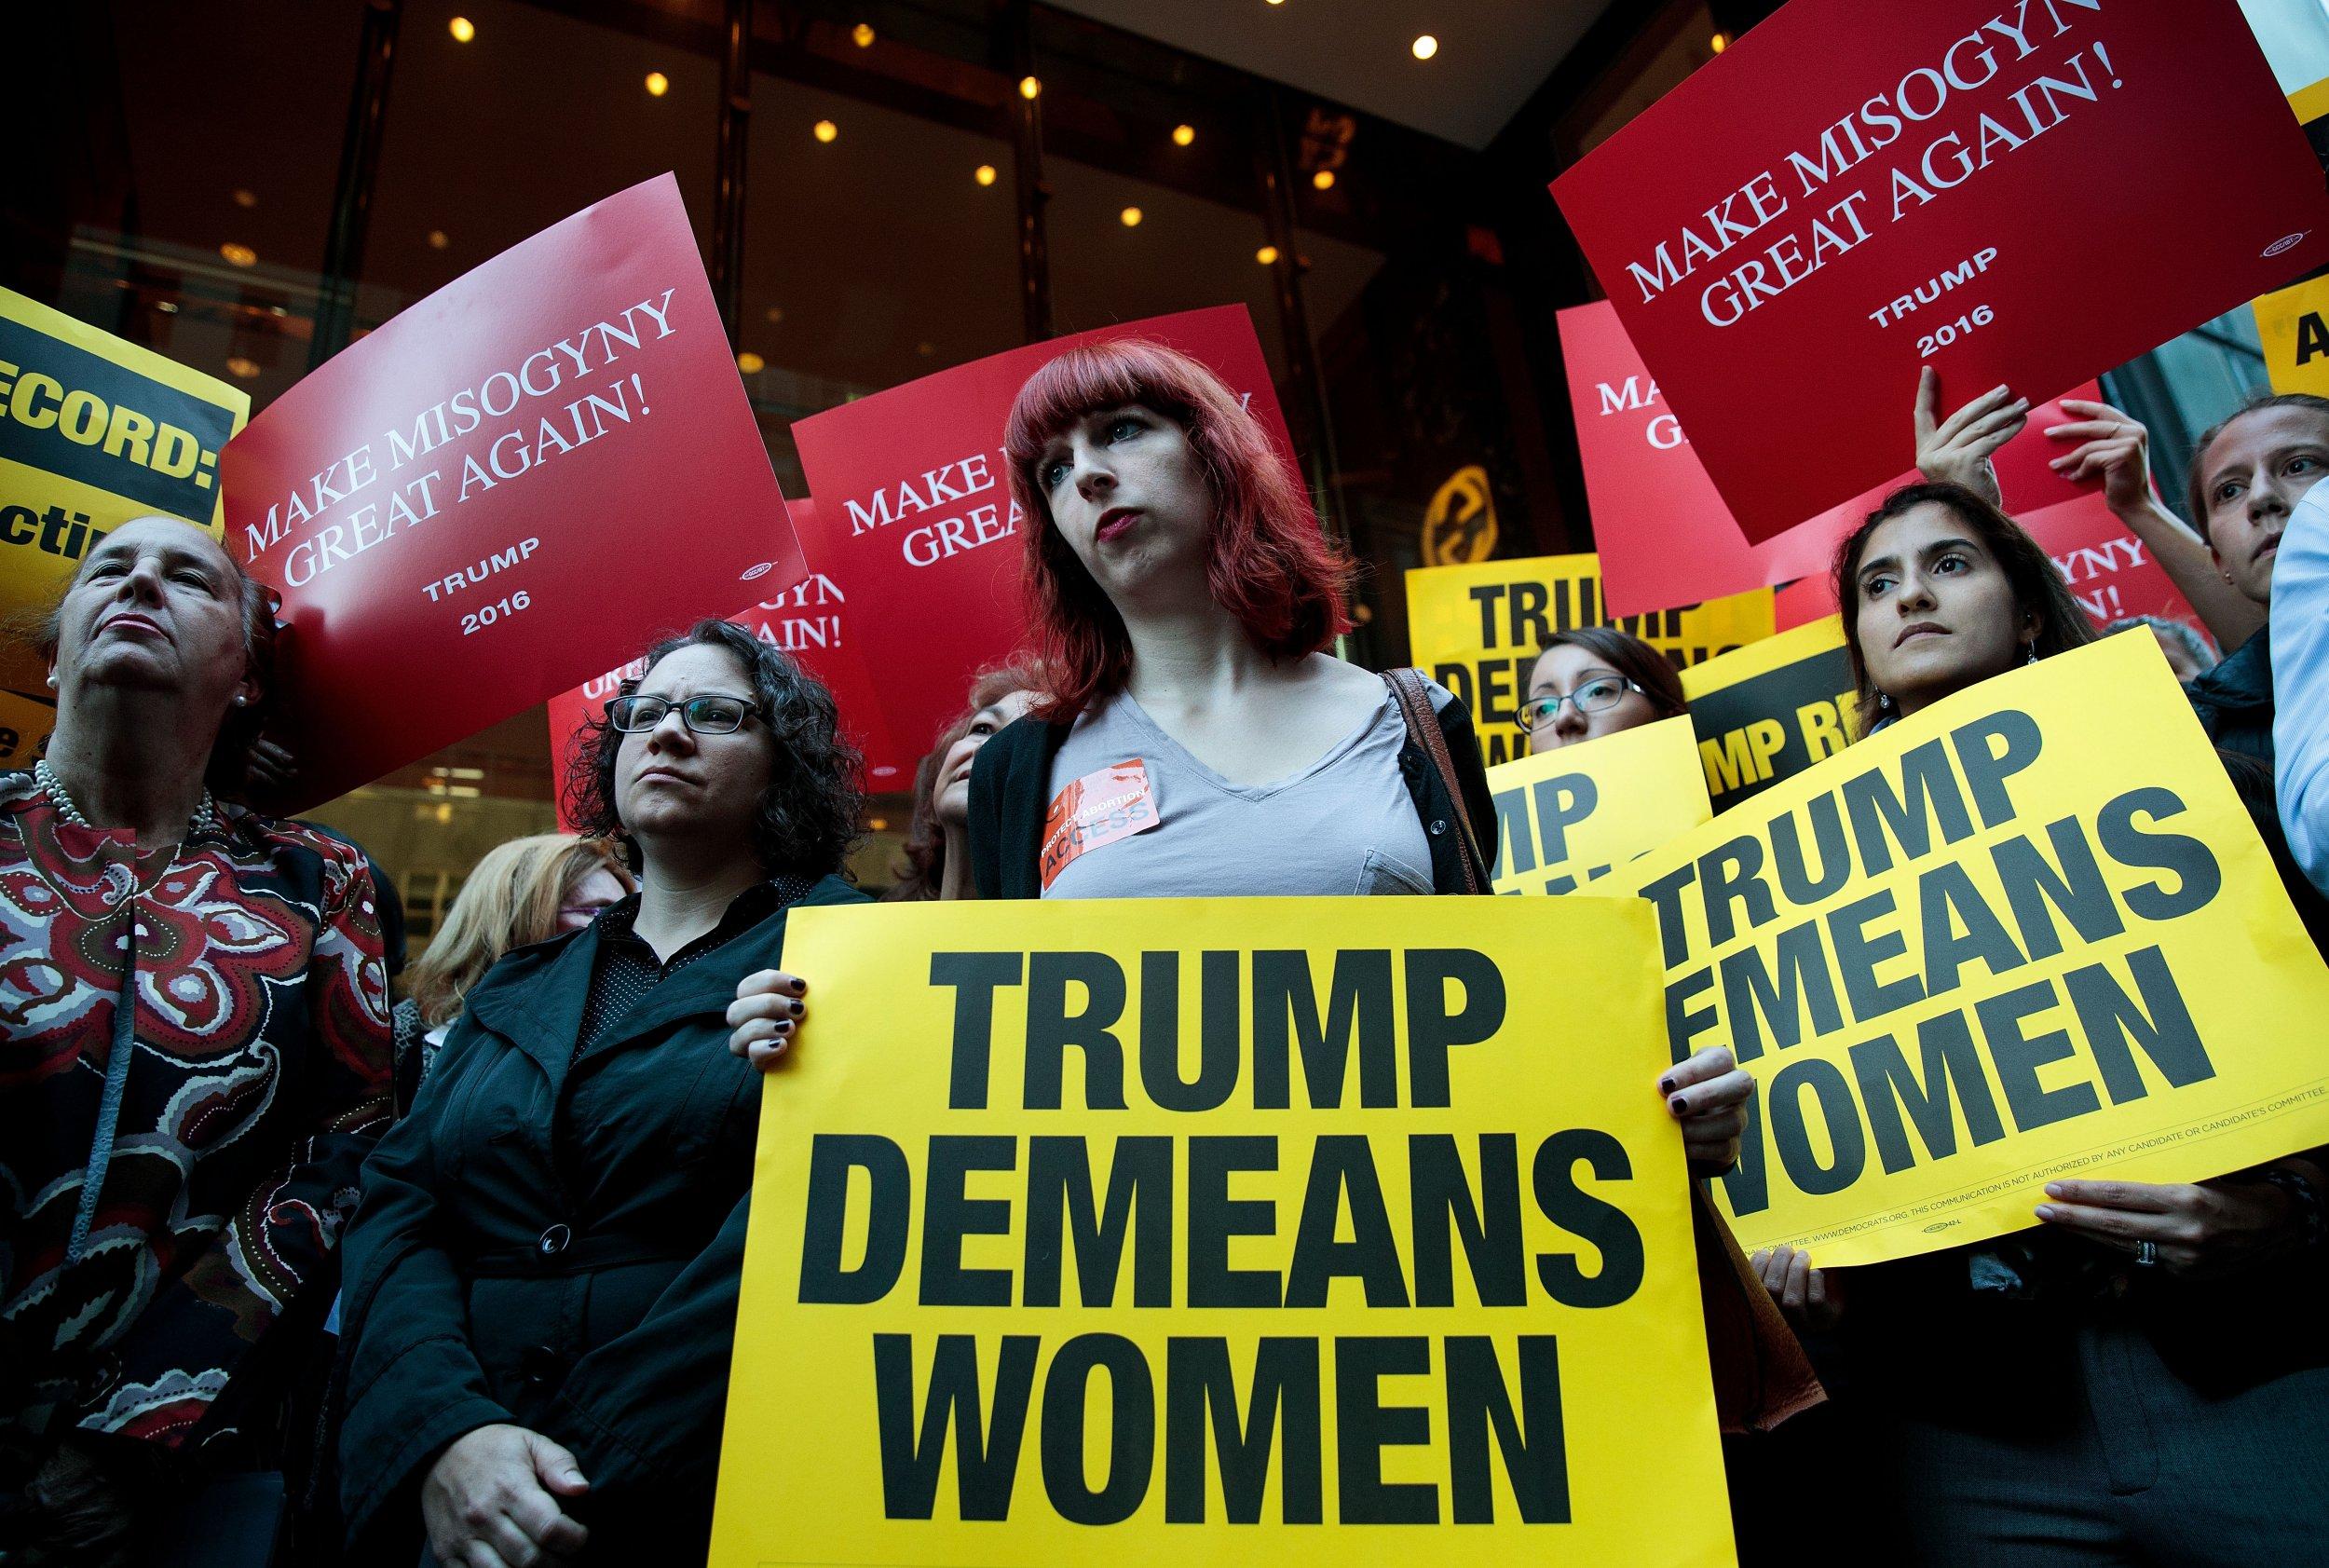 12_13_Trump_sexual_assault